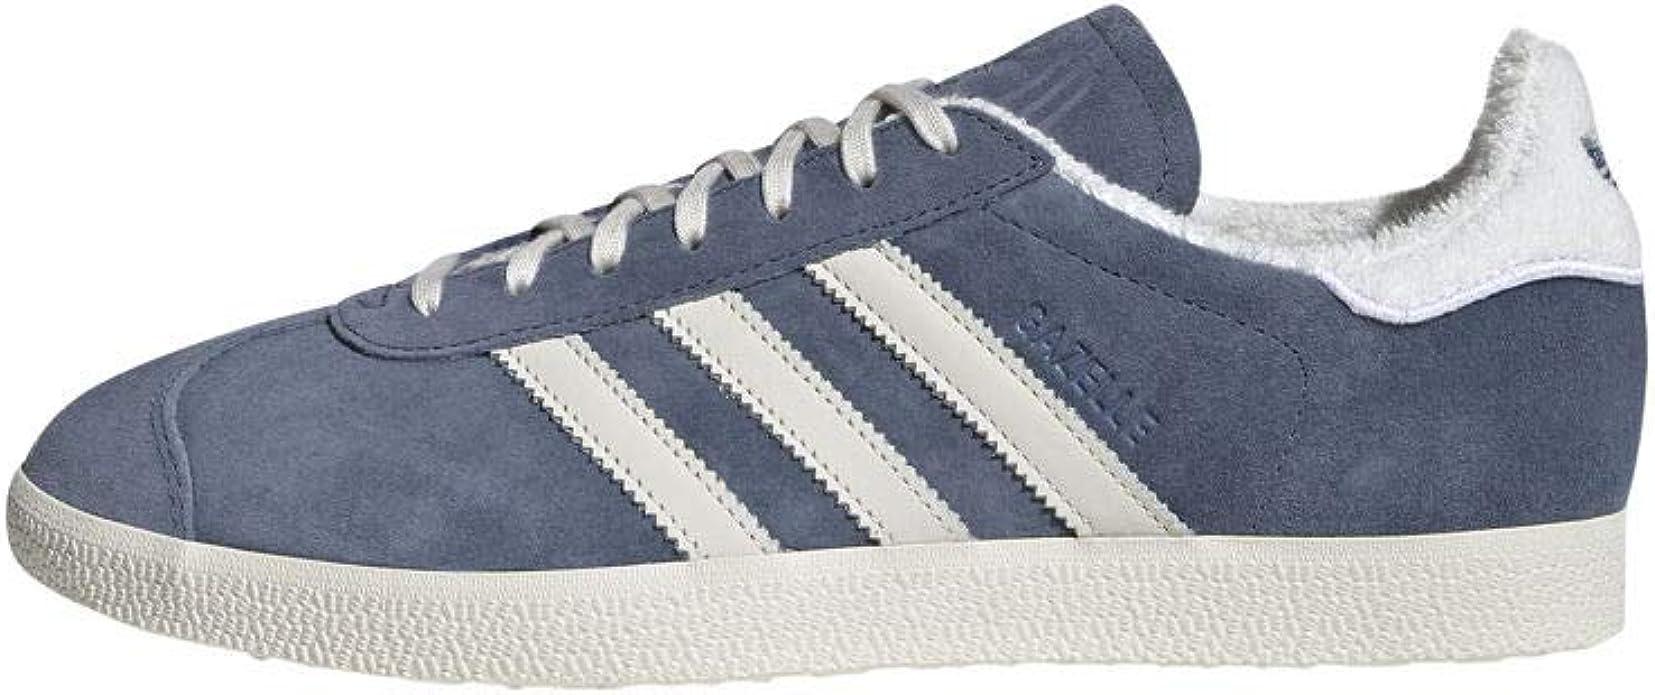 Amazon.com | adidas Gazelle Shoes Men's